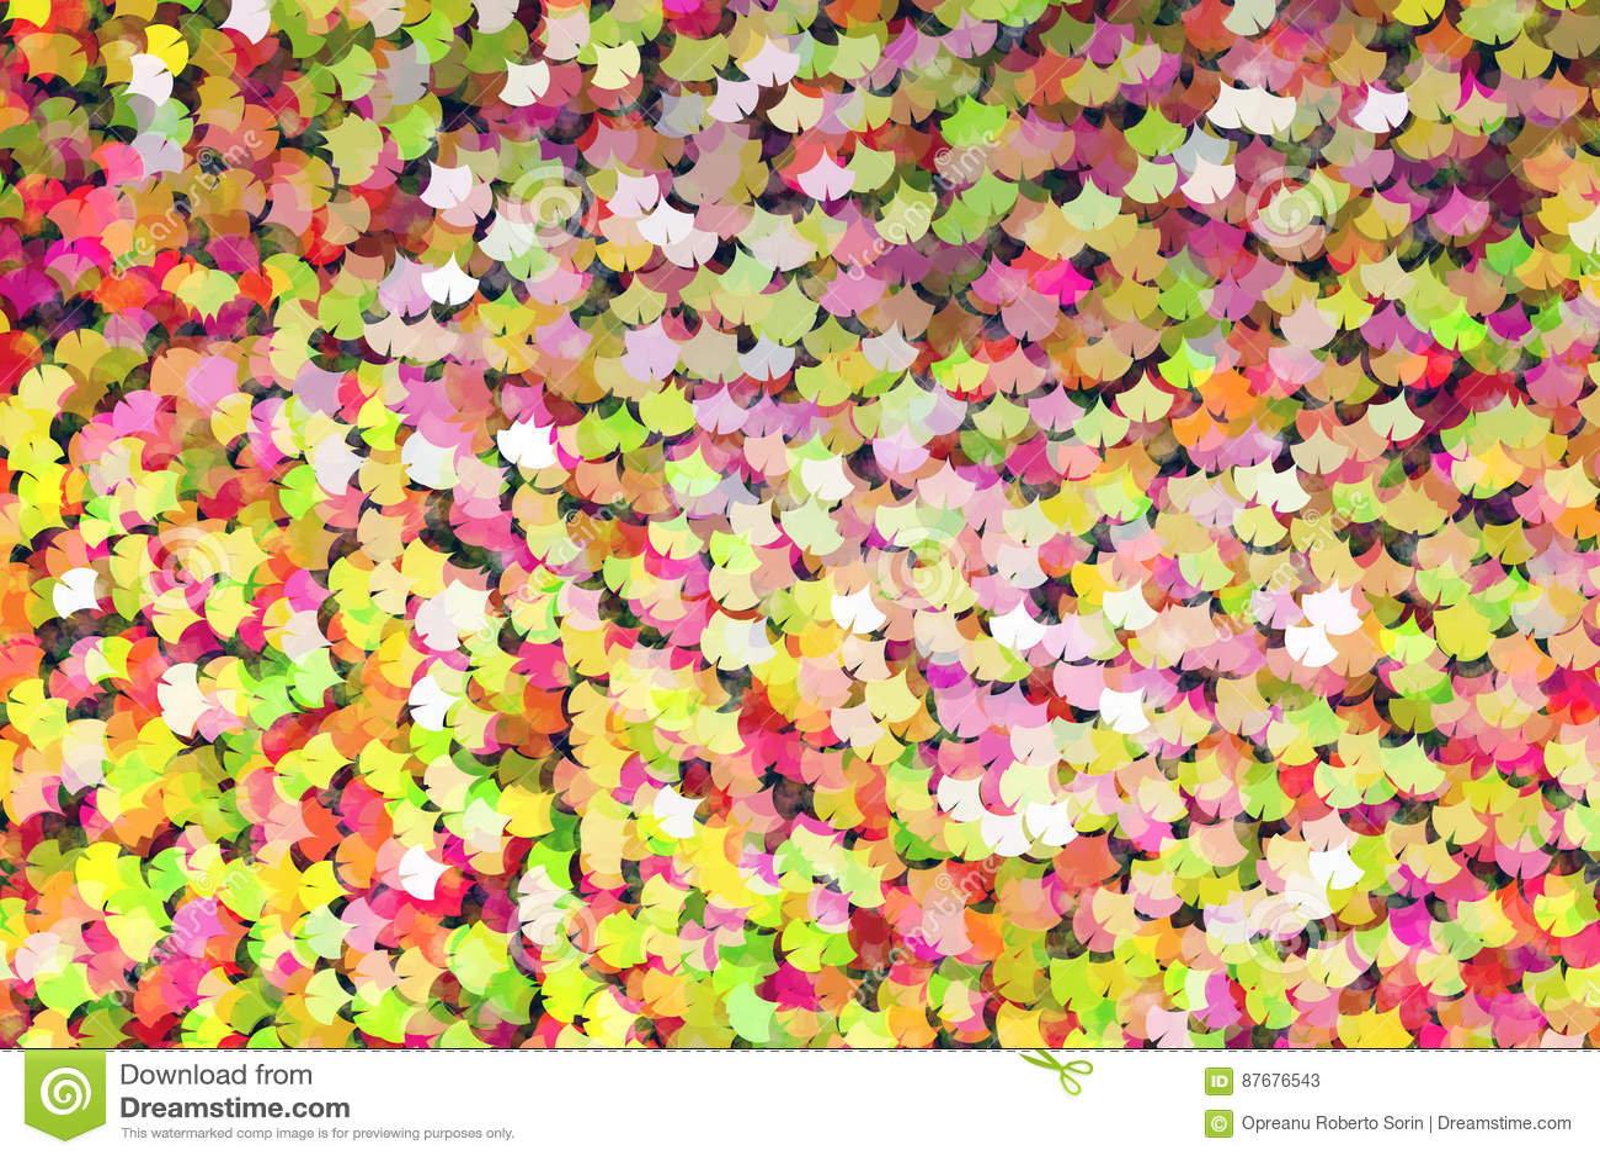 Ginkgo Shape, Abstract Background, Digital Art Work. Stock ...